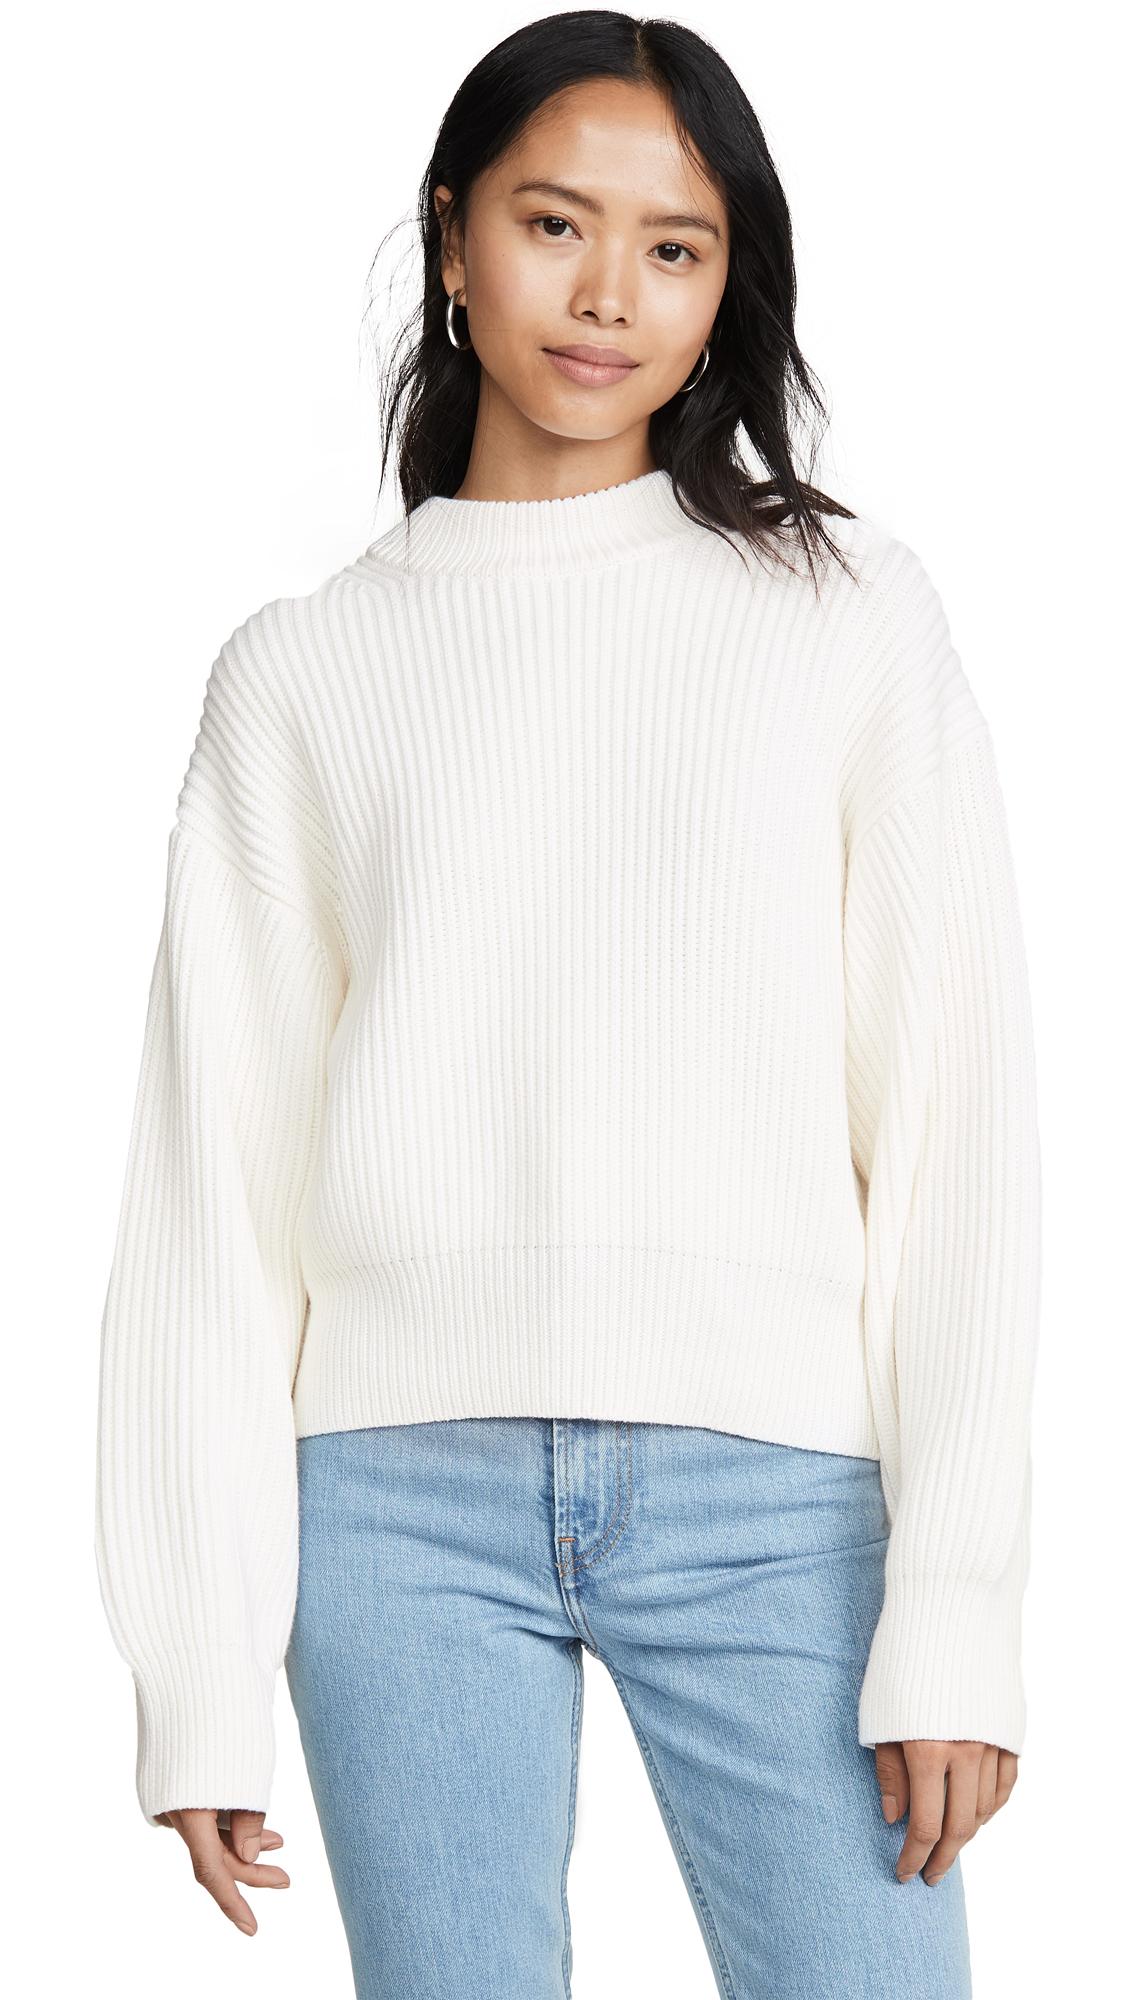 Helmut Lang Wool Cotton Crew Neck Sweater - Ecru